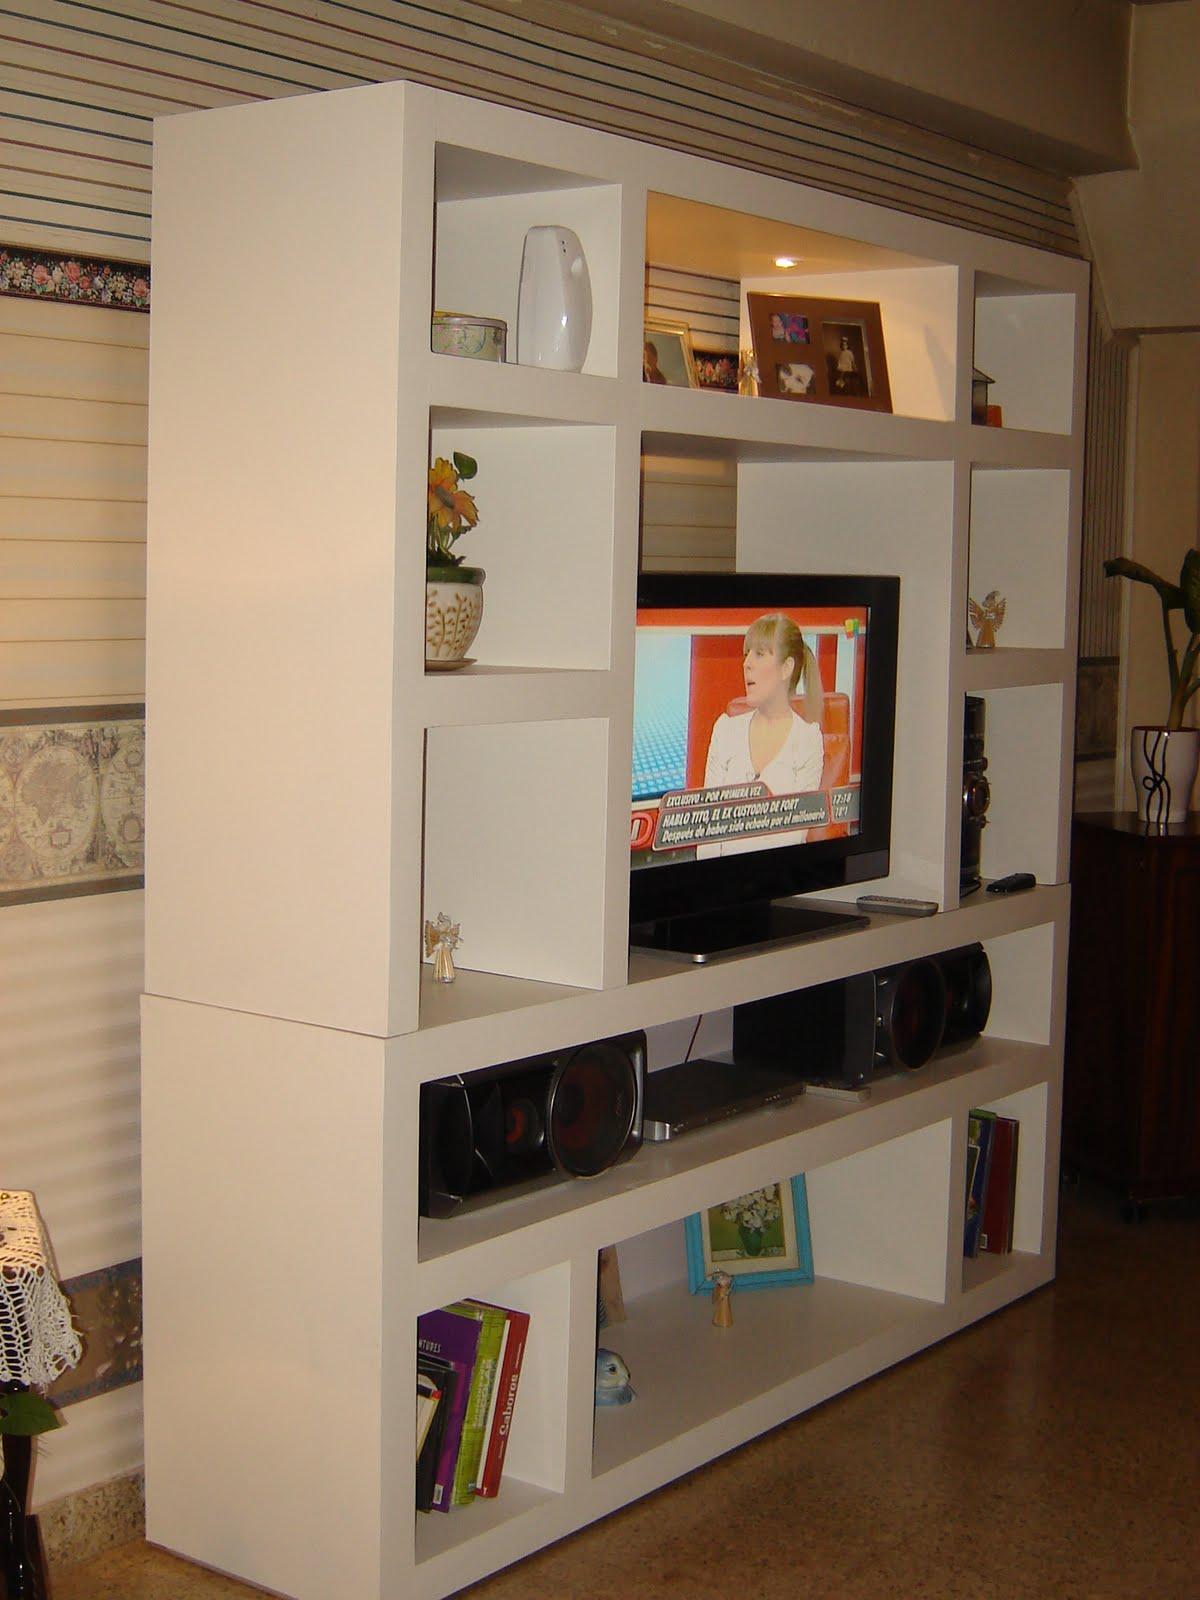 Dise os racks mueble para tv un dise o minimalista for Mueble tv 3 metros